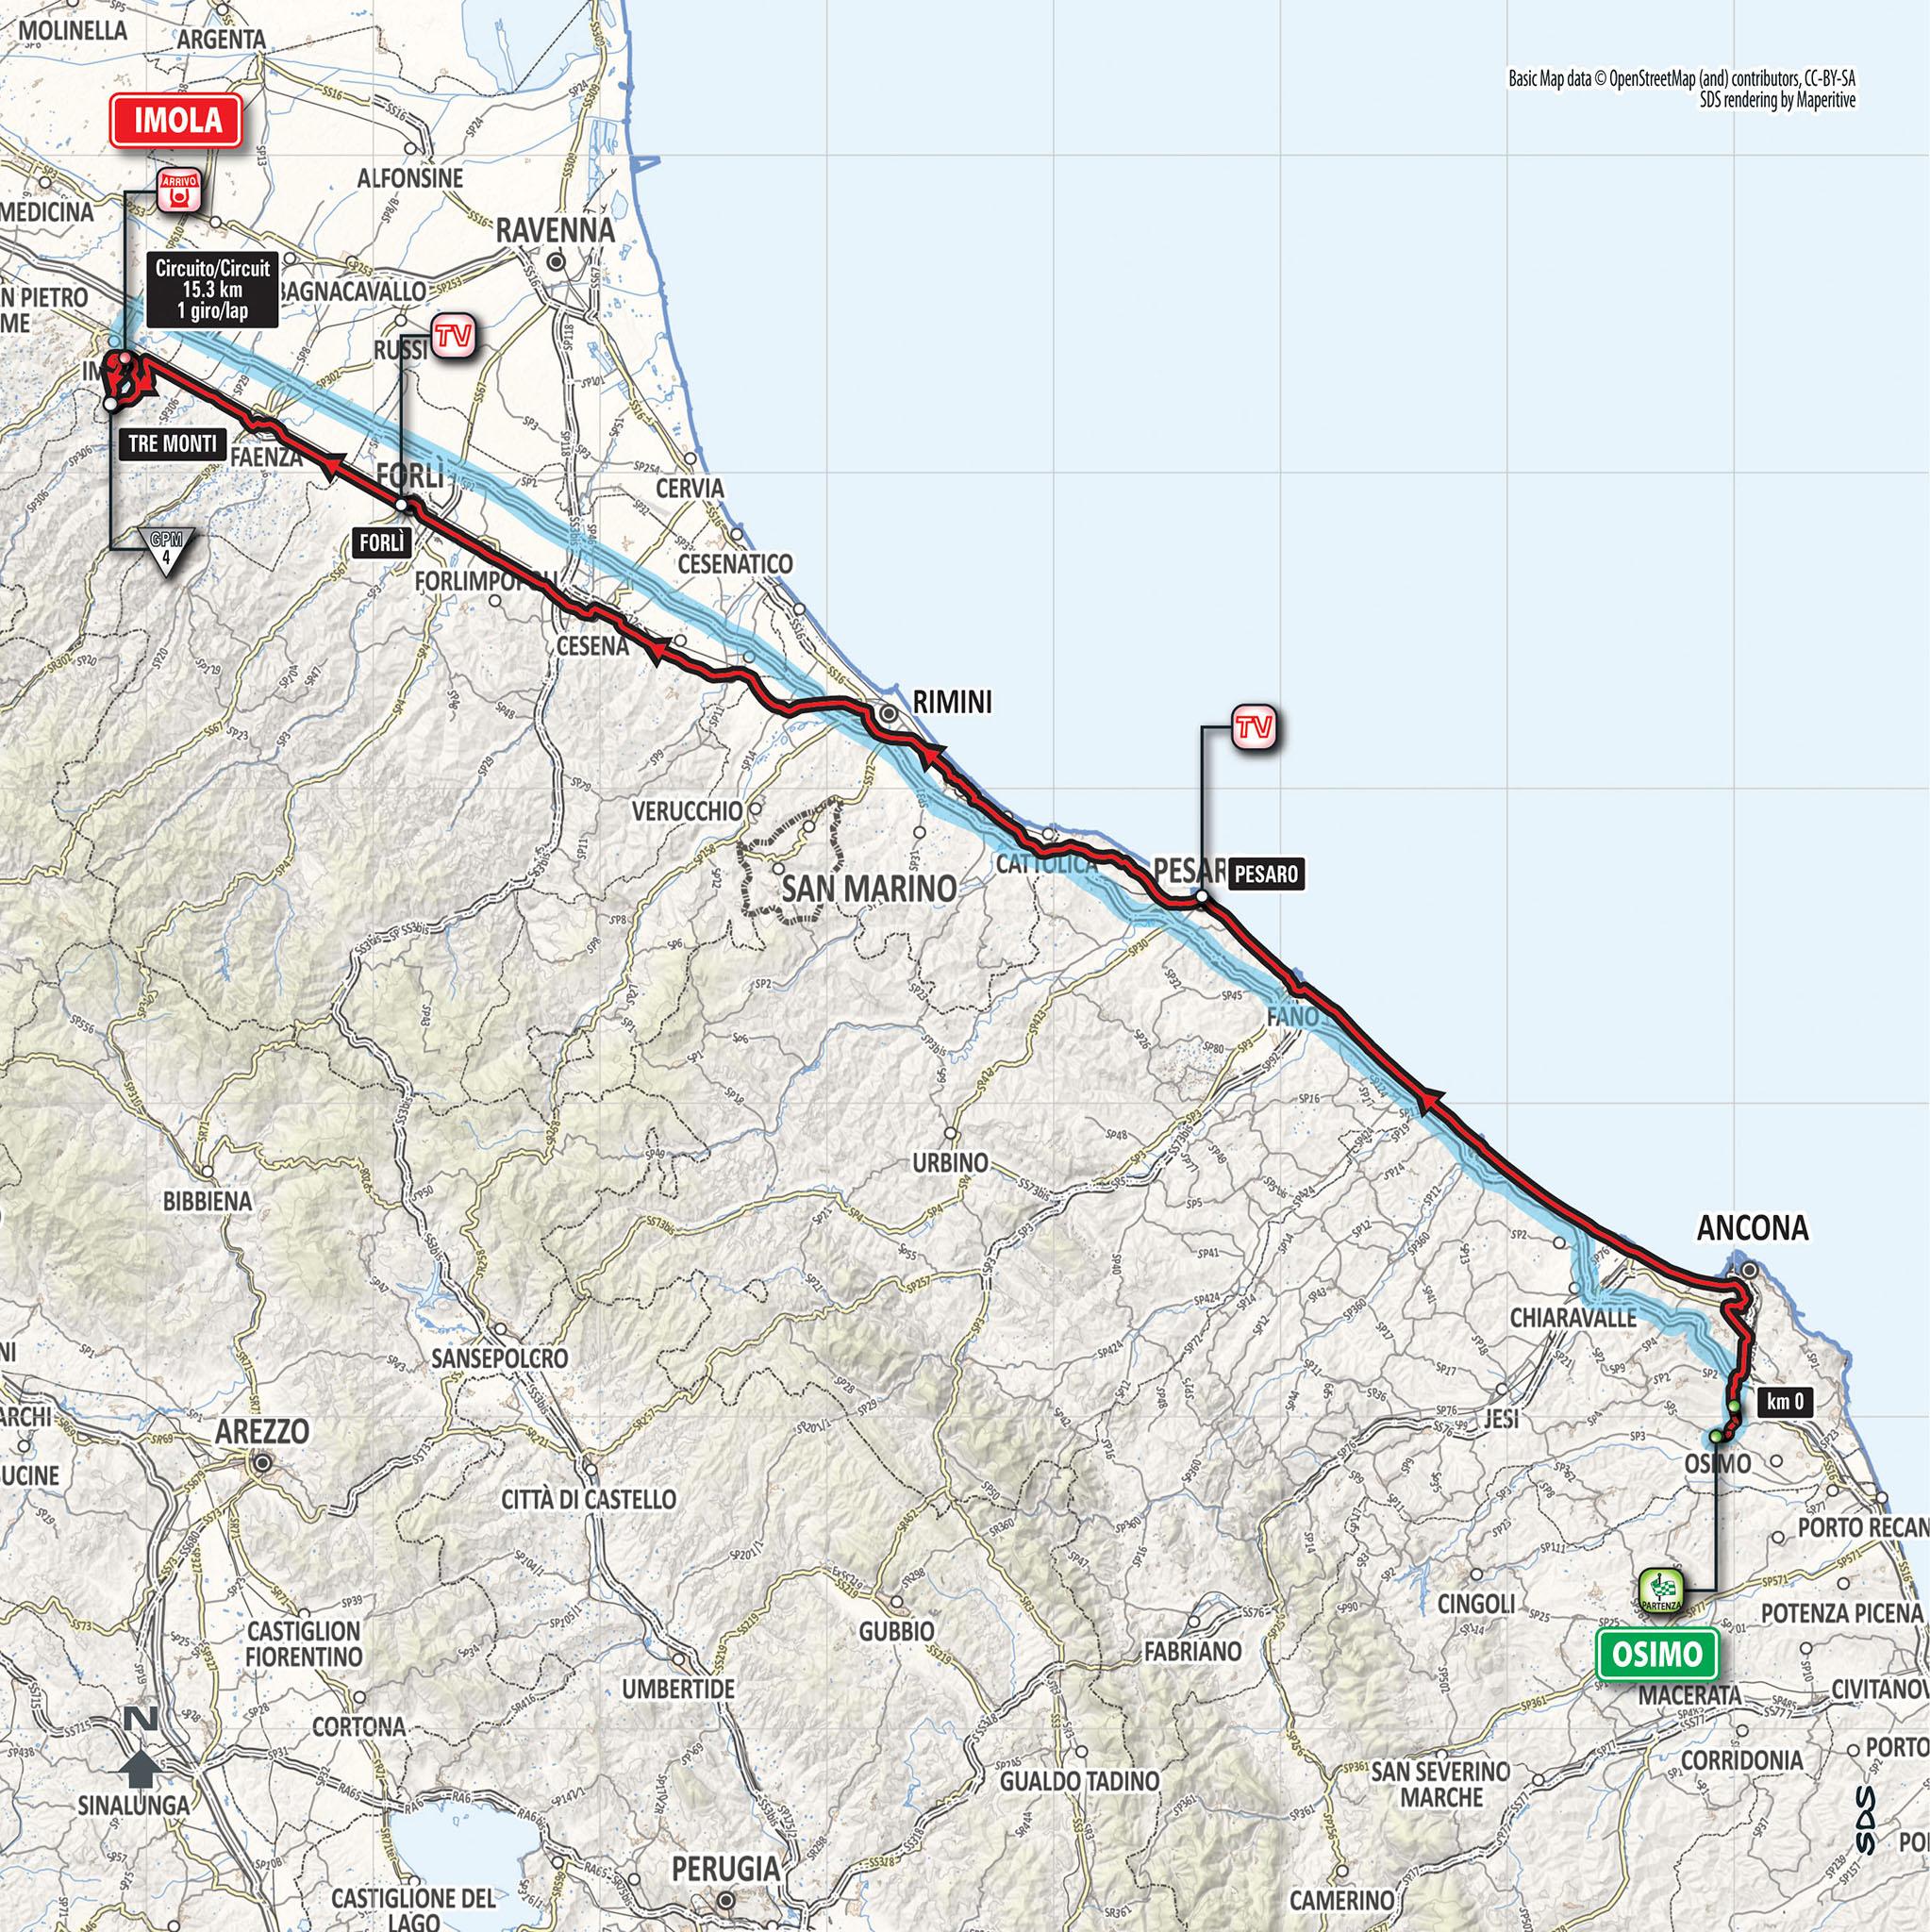 Giro 2018 tappa 12 planimetria